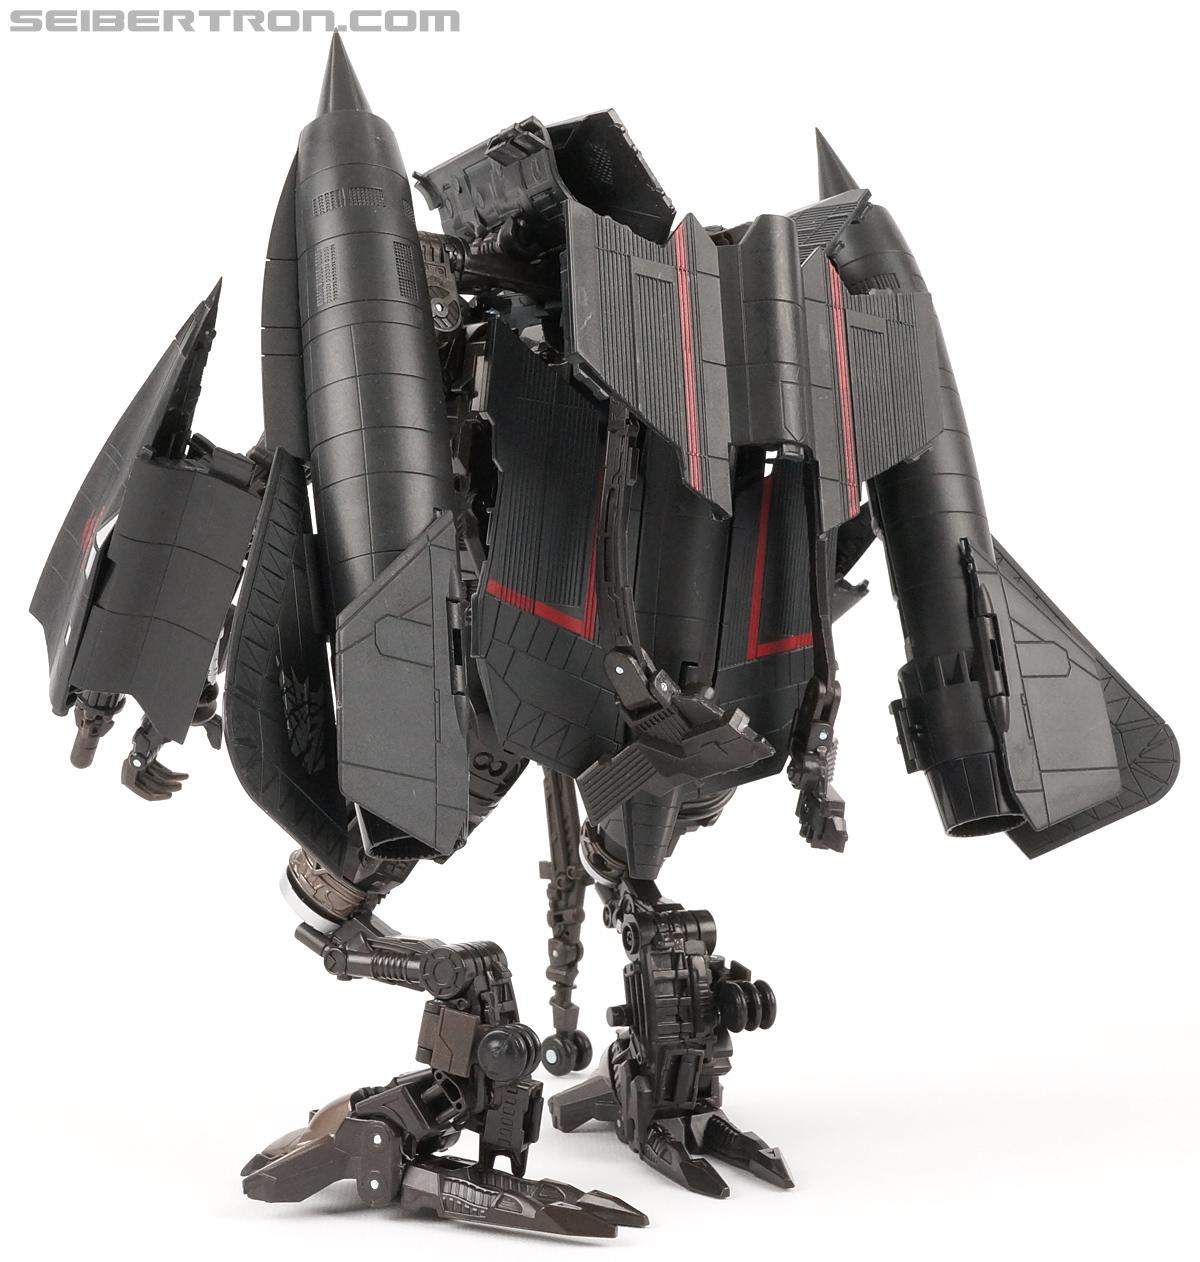 Transformers Revenge of the Fallen Jetfire (Jetpower 2-pack) (Reissue) (Image #63 of 115)